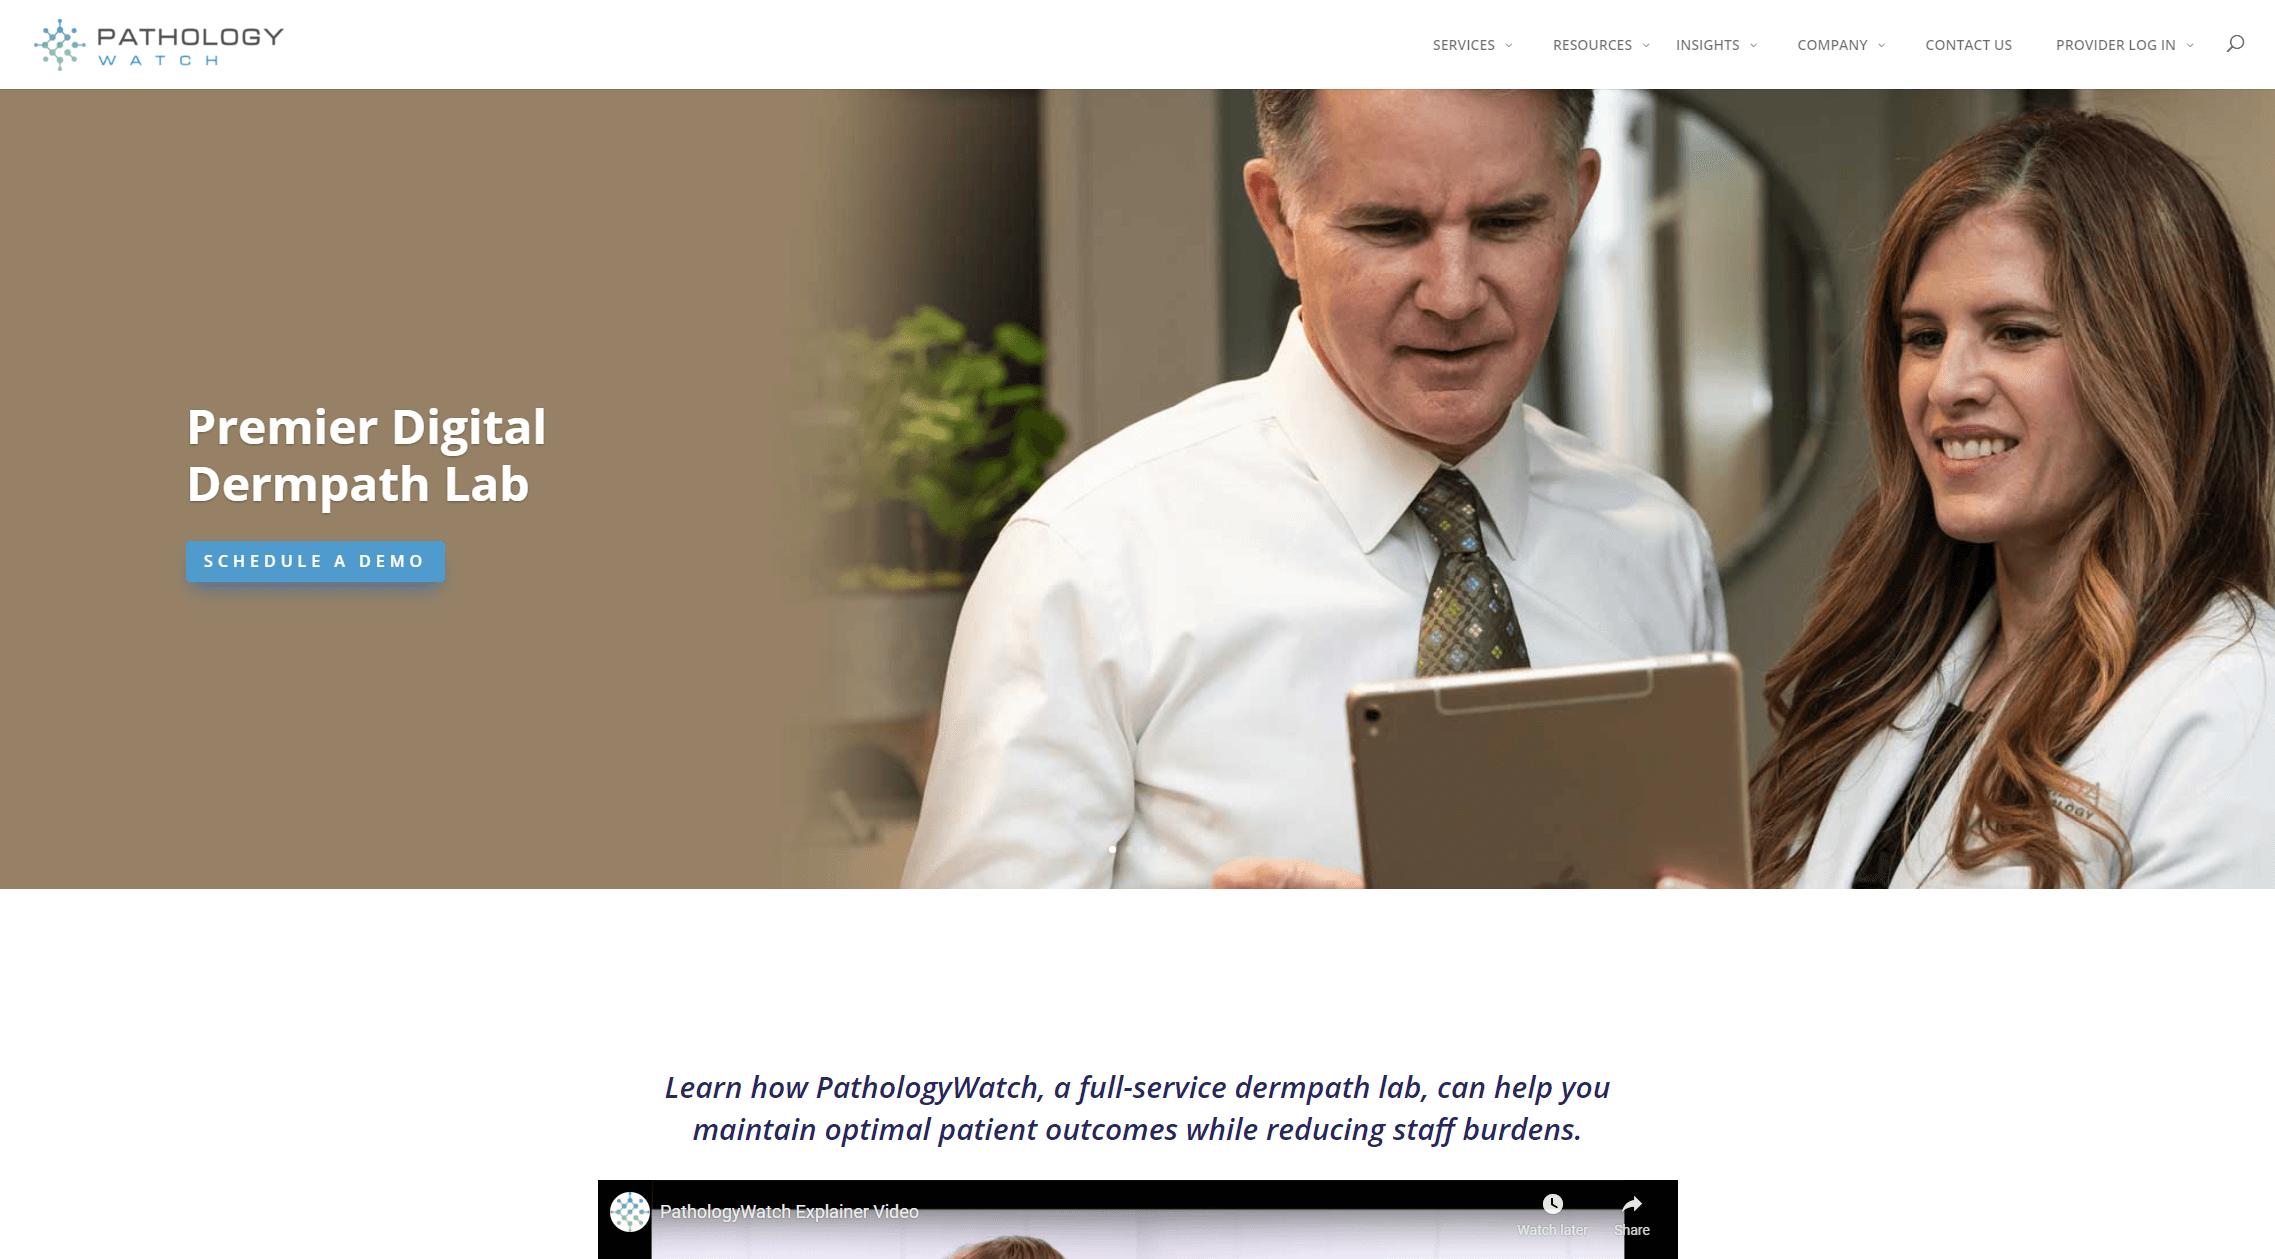 pathologywatch.com